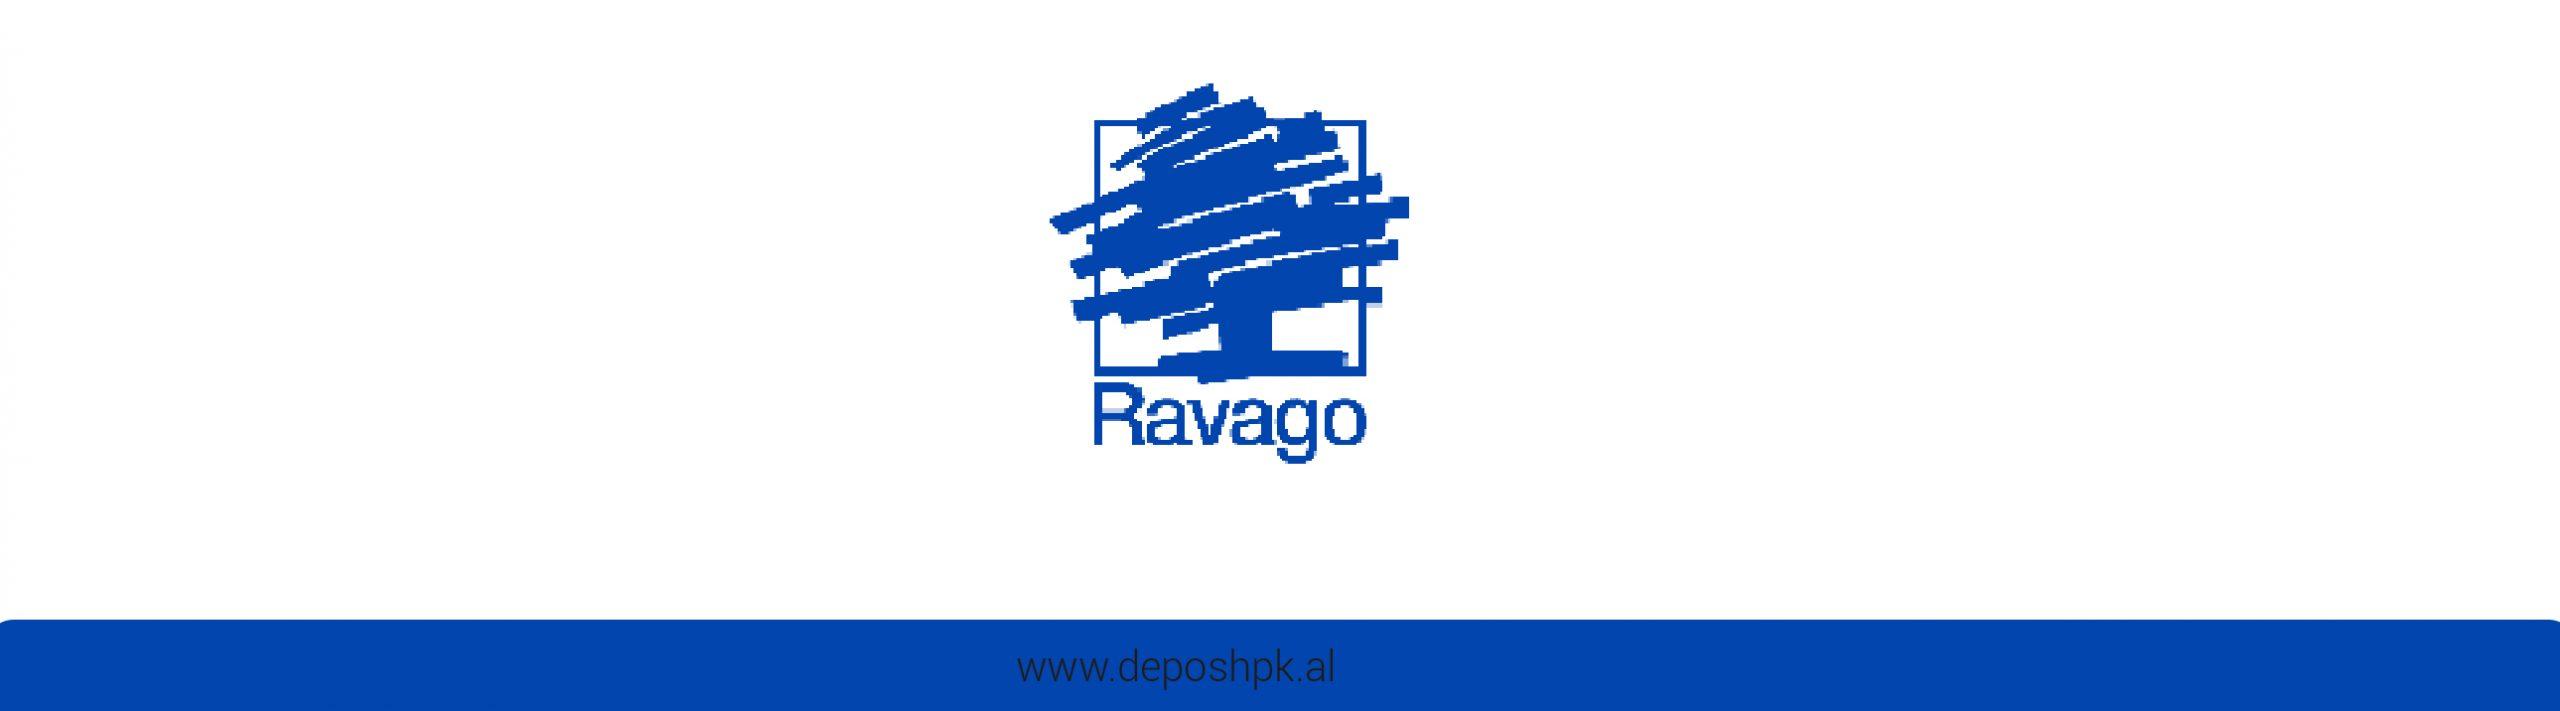 https://www.deposhpk.al/wp-content/uploads/2019/12/ravago-produkt-deposhpk.al_-1-scaled.jpg